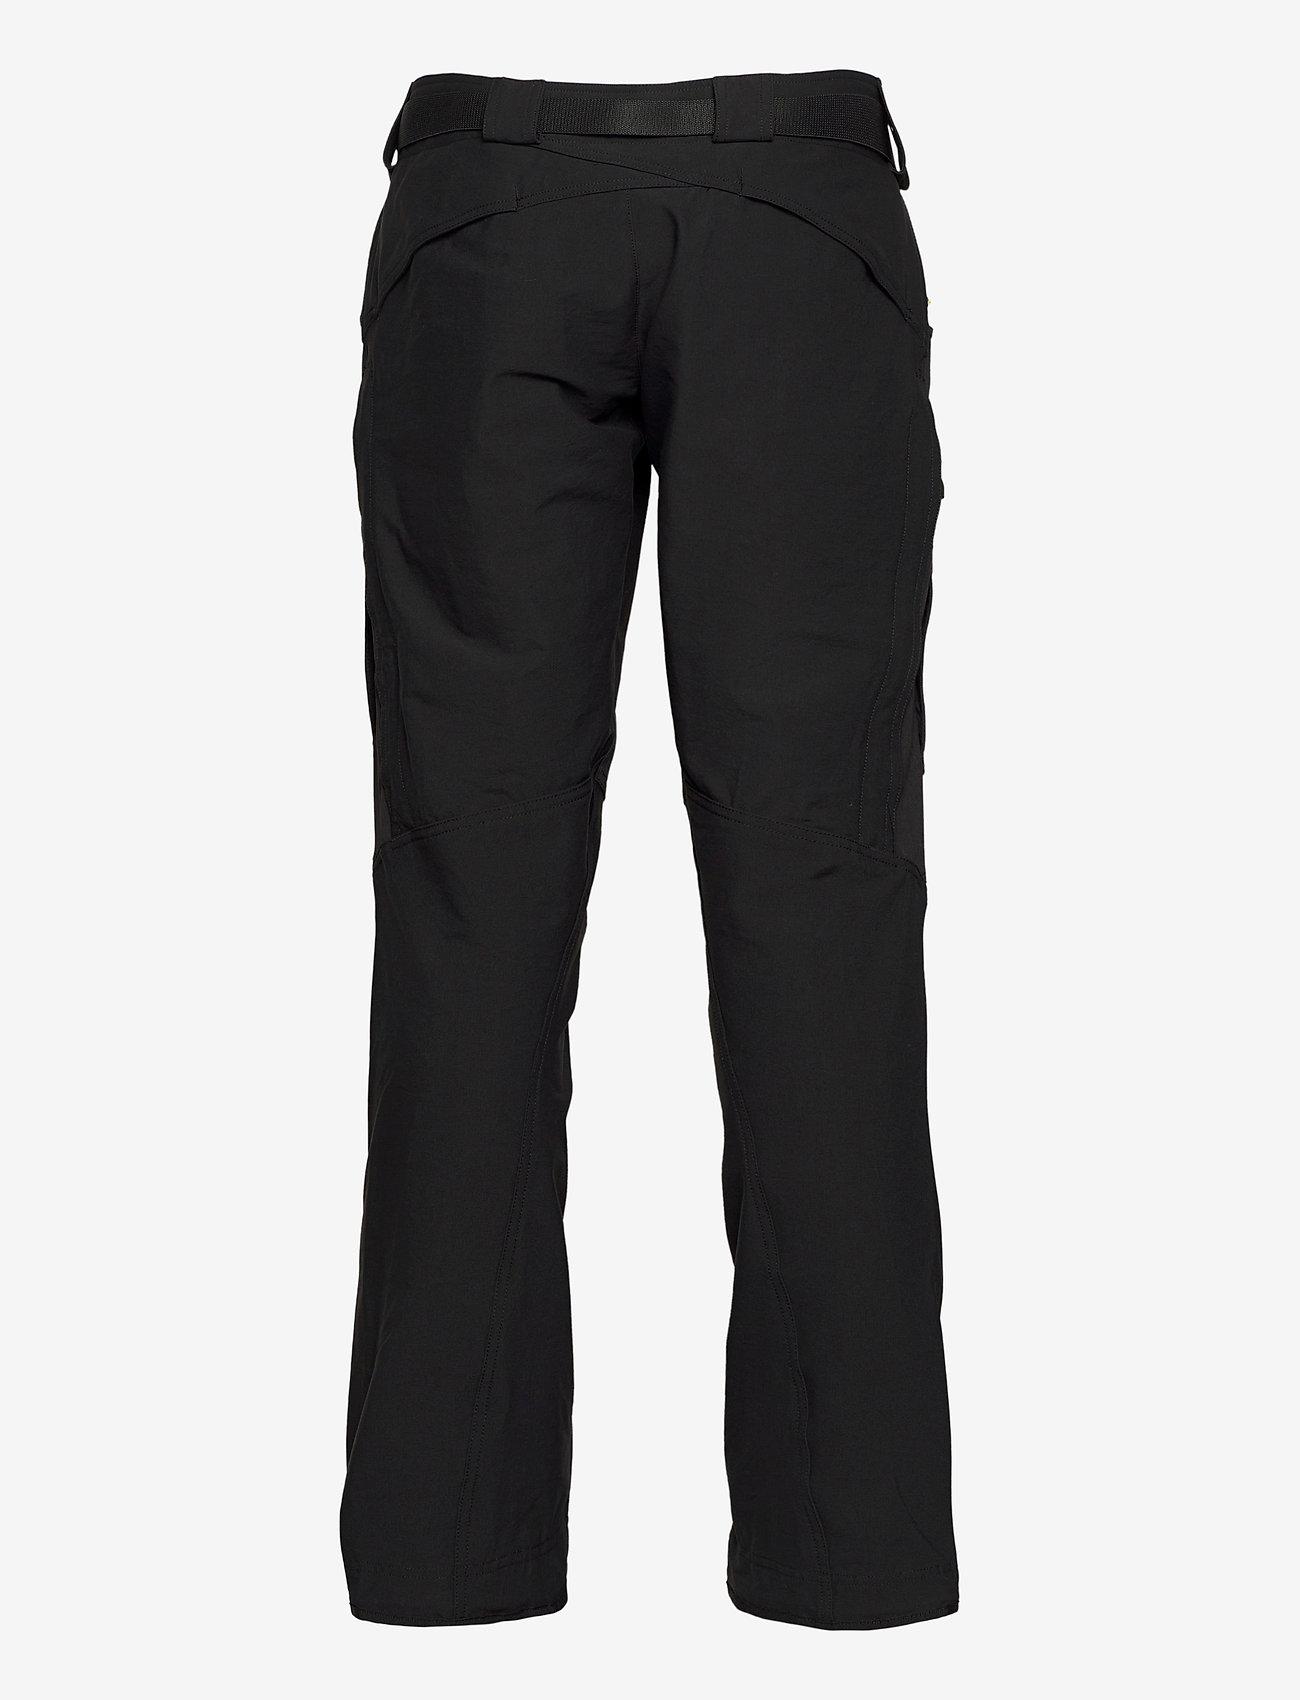 Klättermusen - Gere 2.0 Pants Regular M's - outdoorbukser - black - 1